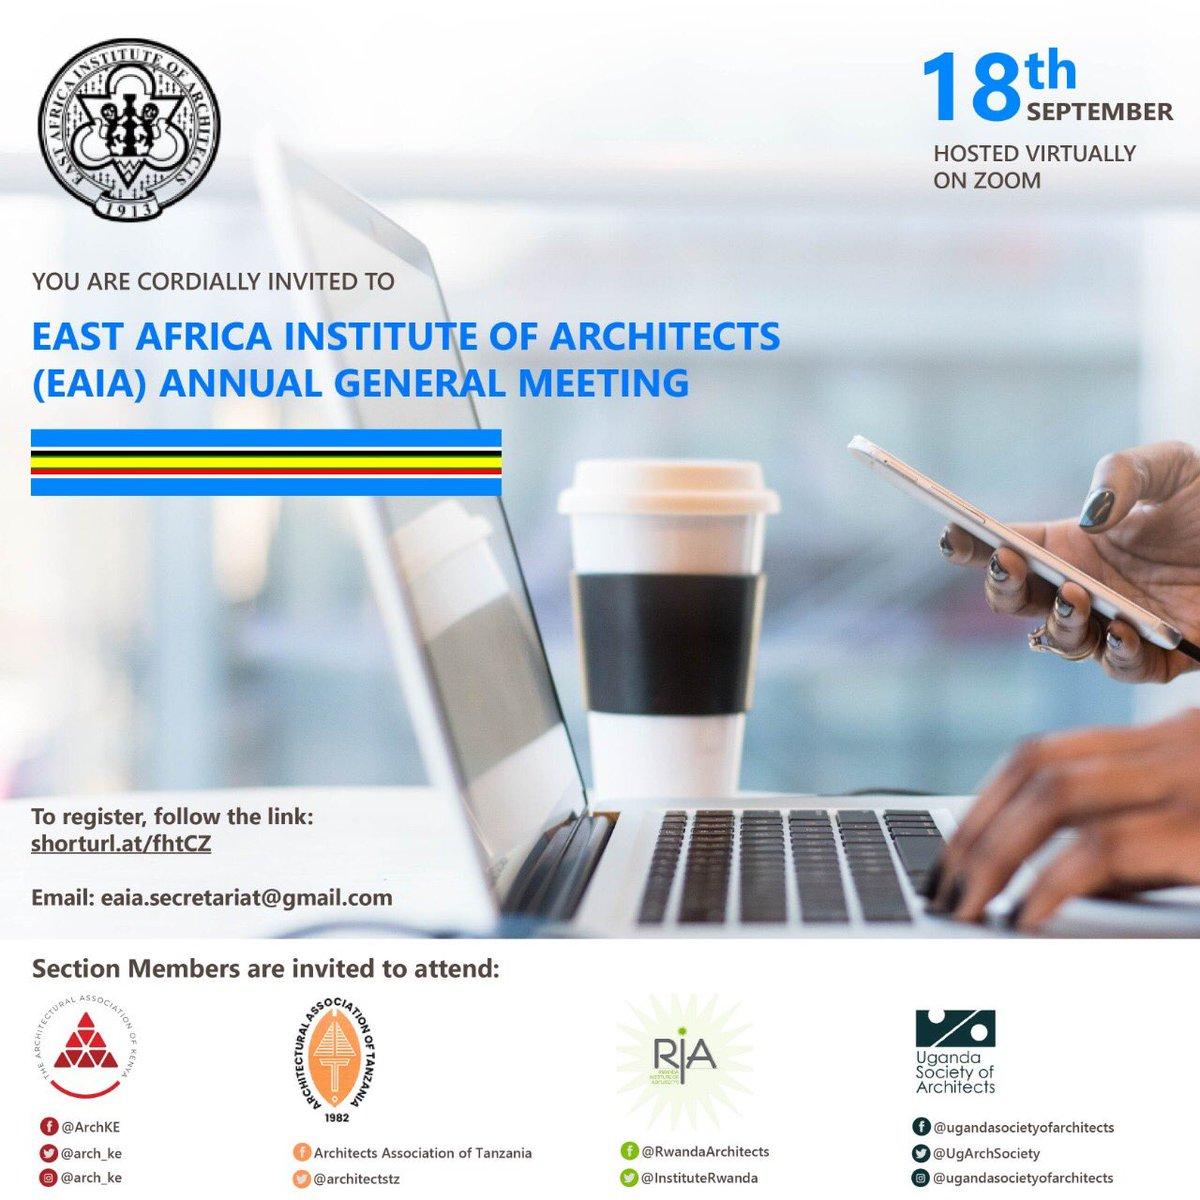 The East African Institute of Architects invites you to its AGM to be held this Friday on the 18 September 2020. @KKCONSULTINGAR1 @RIBA @Arch_KE @architectandre @kaigu55 @UIA_Architects @ArchDaily @IAZimbabwe @ArchForumUganda @ArchSsinab @AUA_UAA @WanyangaStephen  @besa_fobe https://t.co/7SOugZiaga